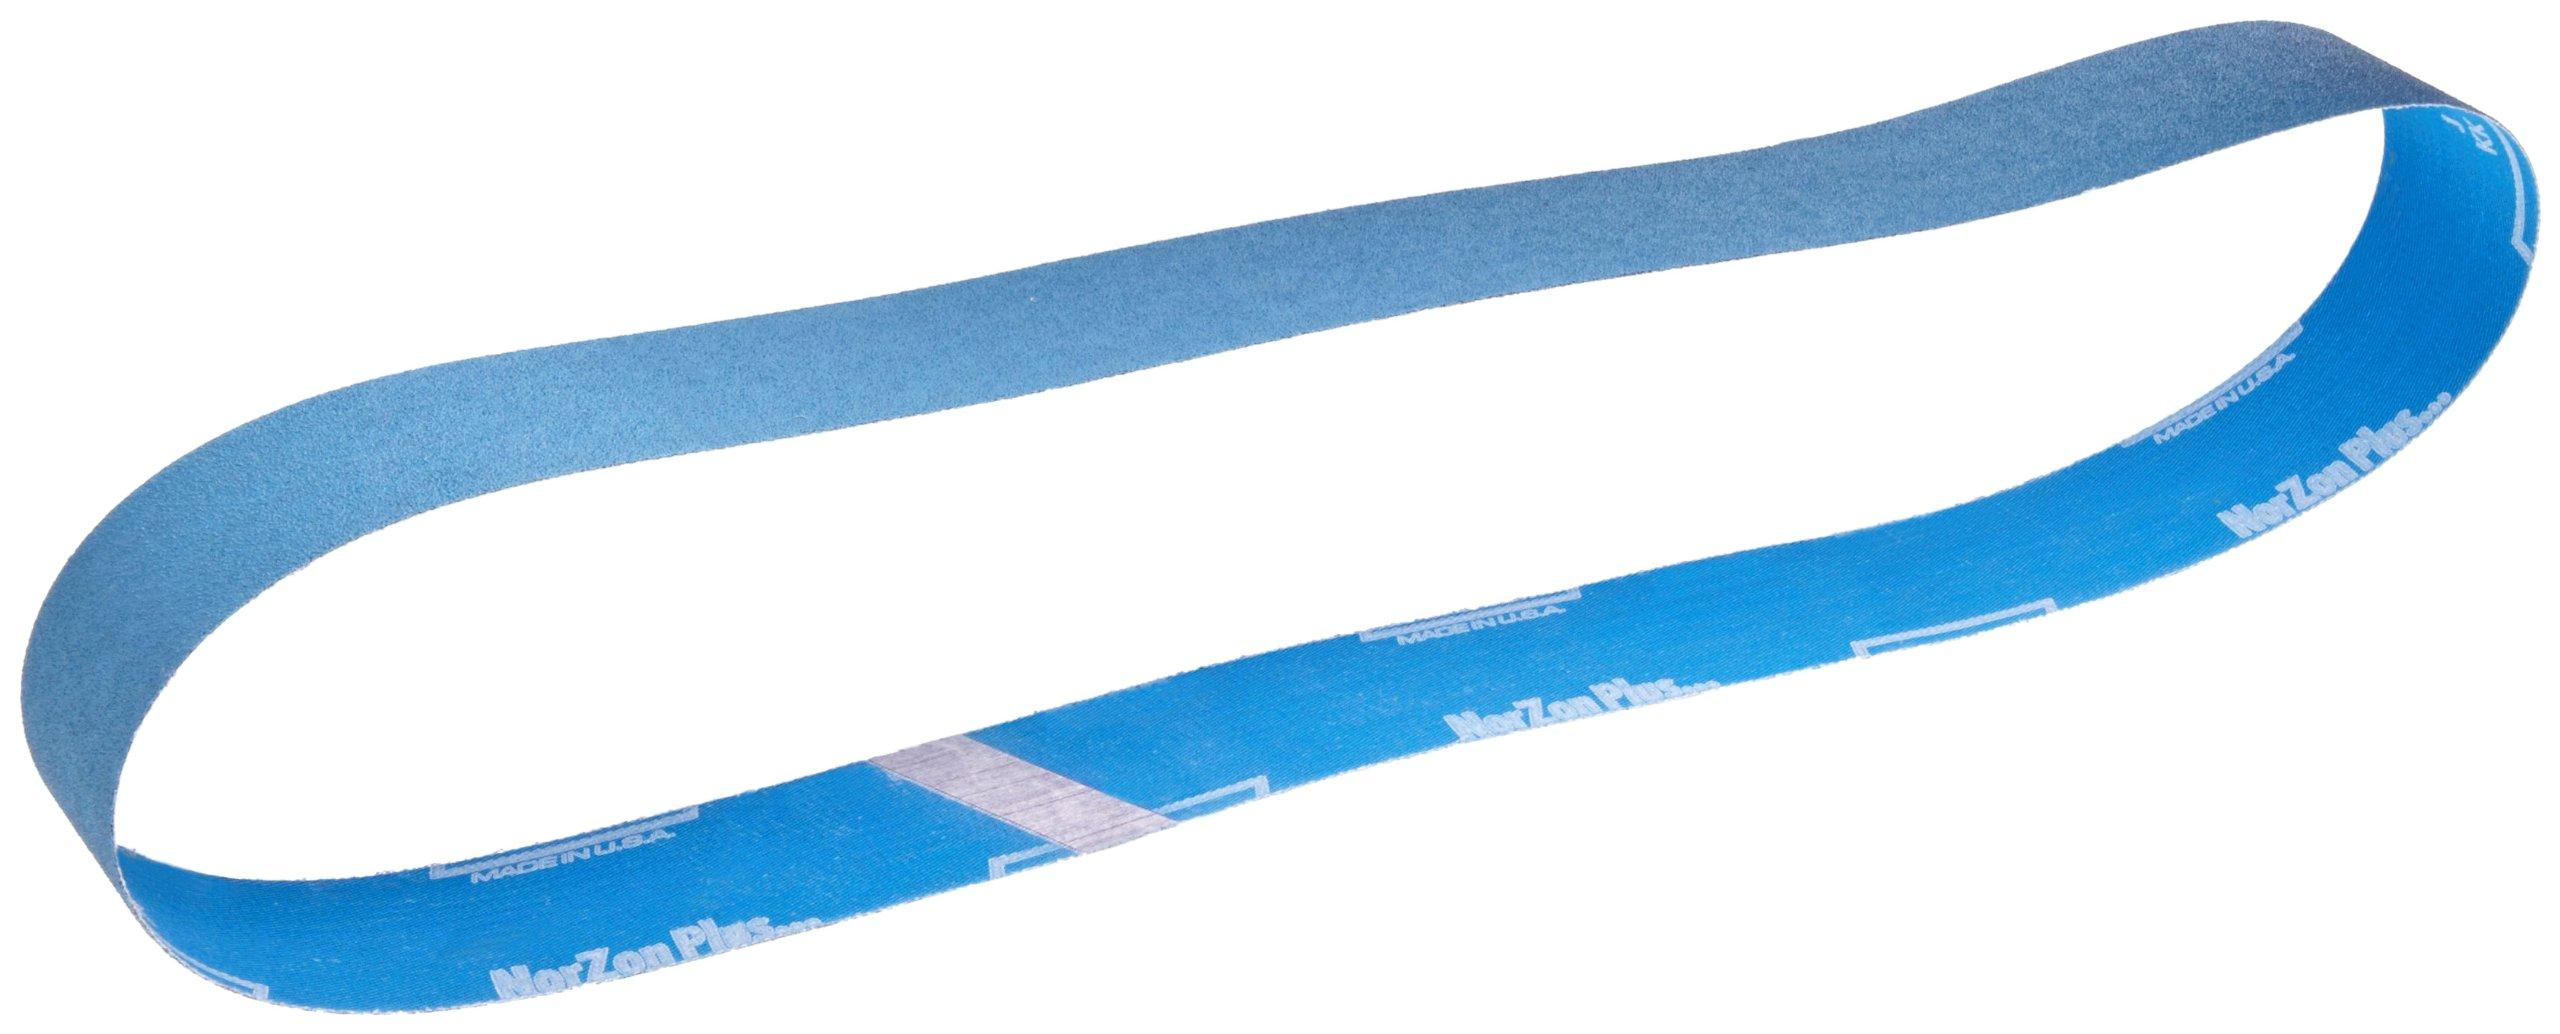 Norton BlueFire R823P Benchstand Abrasive Belt, Polyester Backing, Zirconia Alumina, Waterproof, 6'' Width x 48'' Length, Grit 80 (Pack of 20)